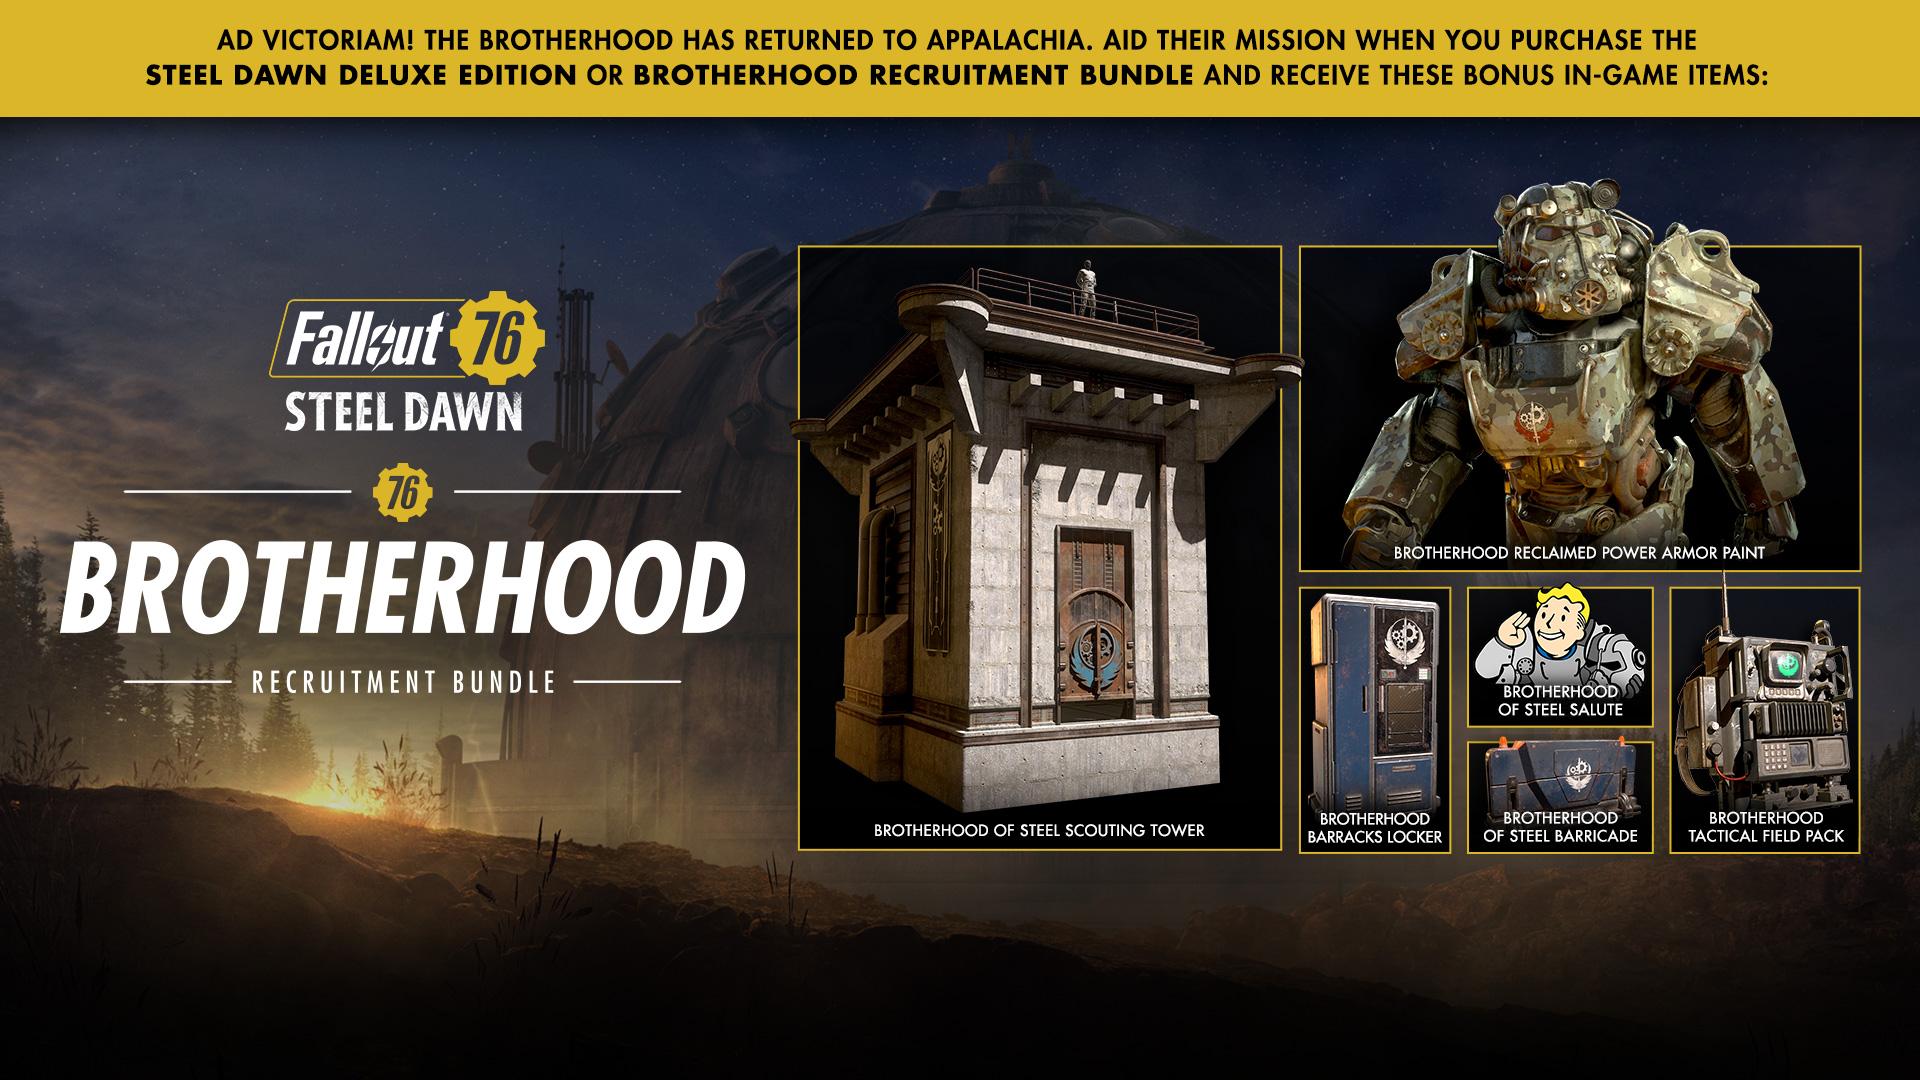 Fallout76-BrotherhoodBundle Bnet vanity 1920x1080-EN-04